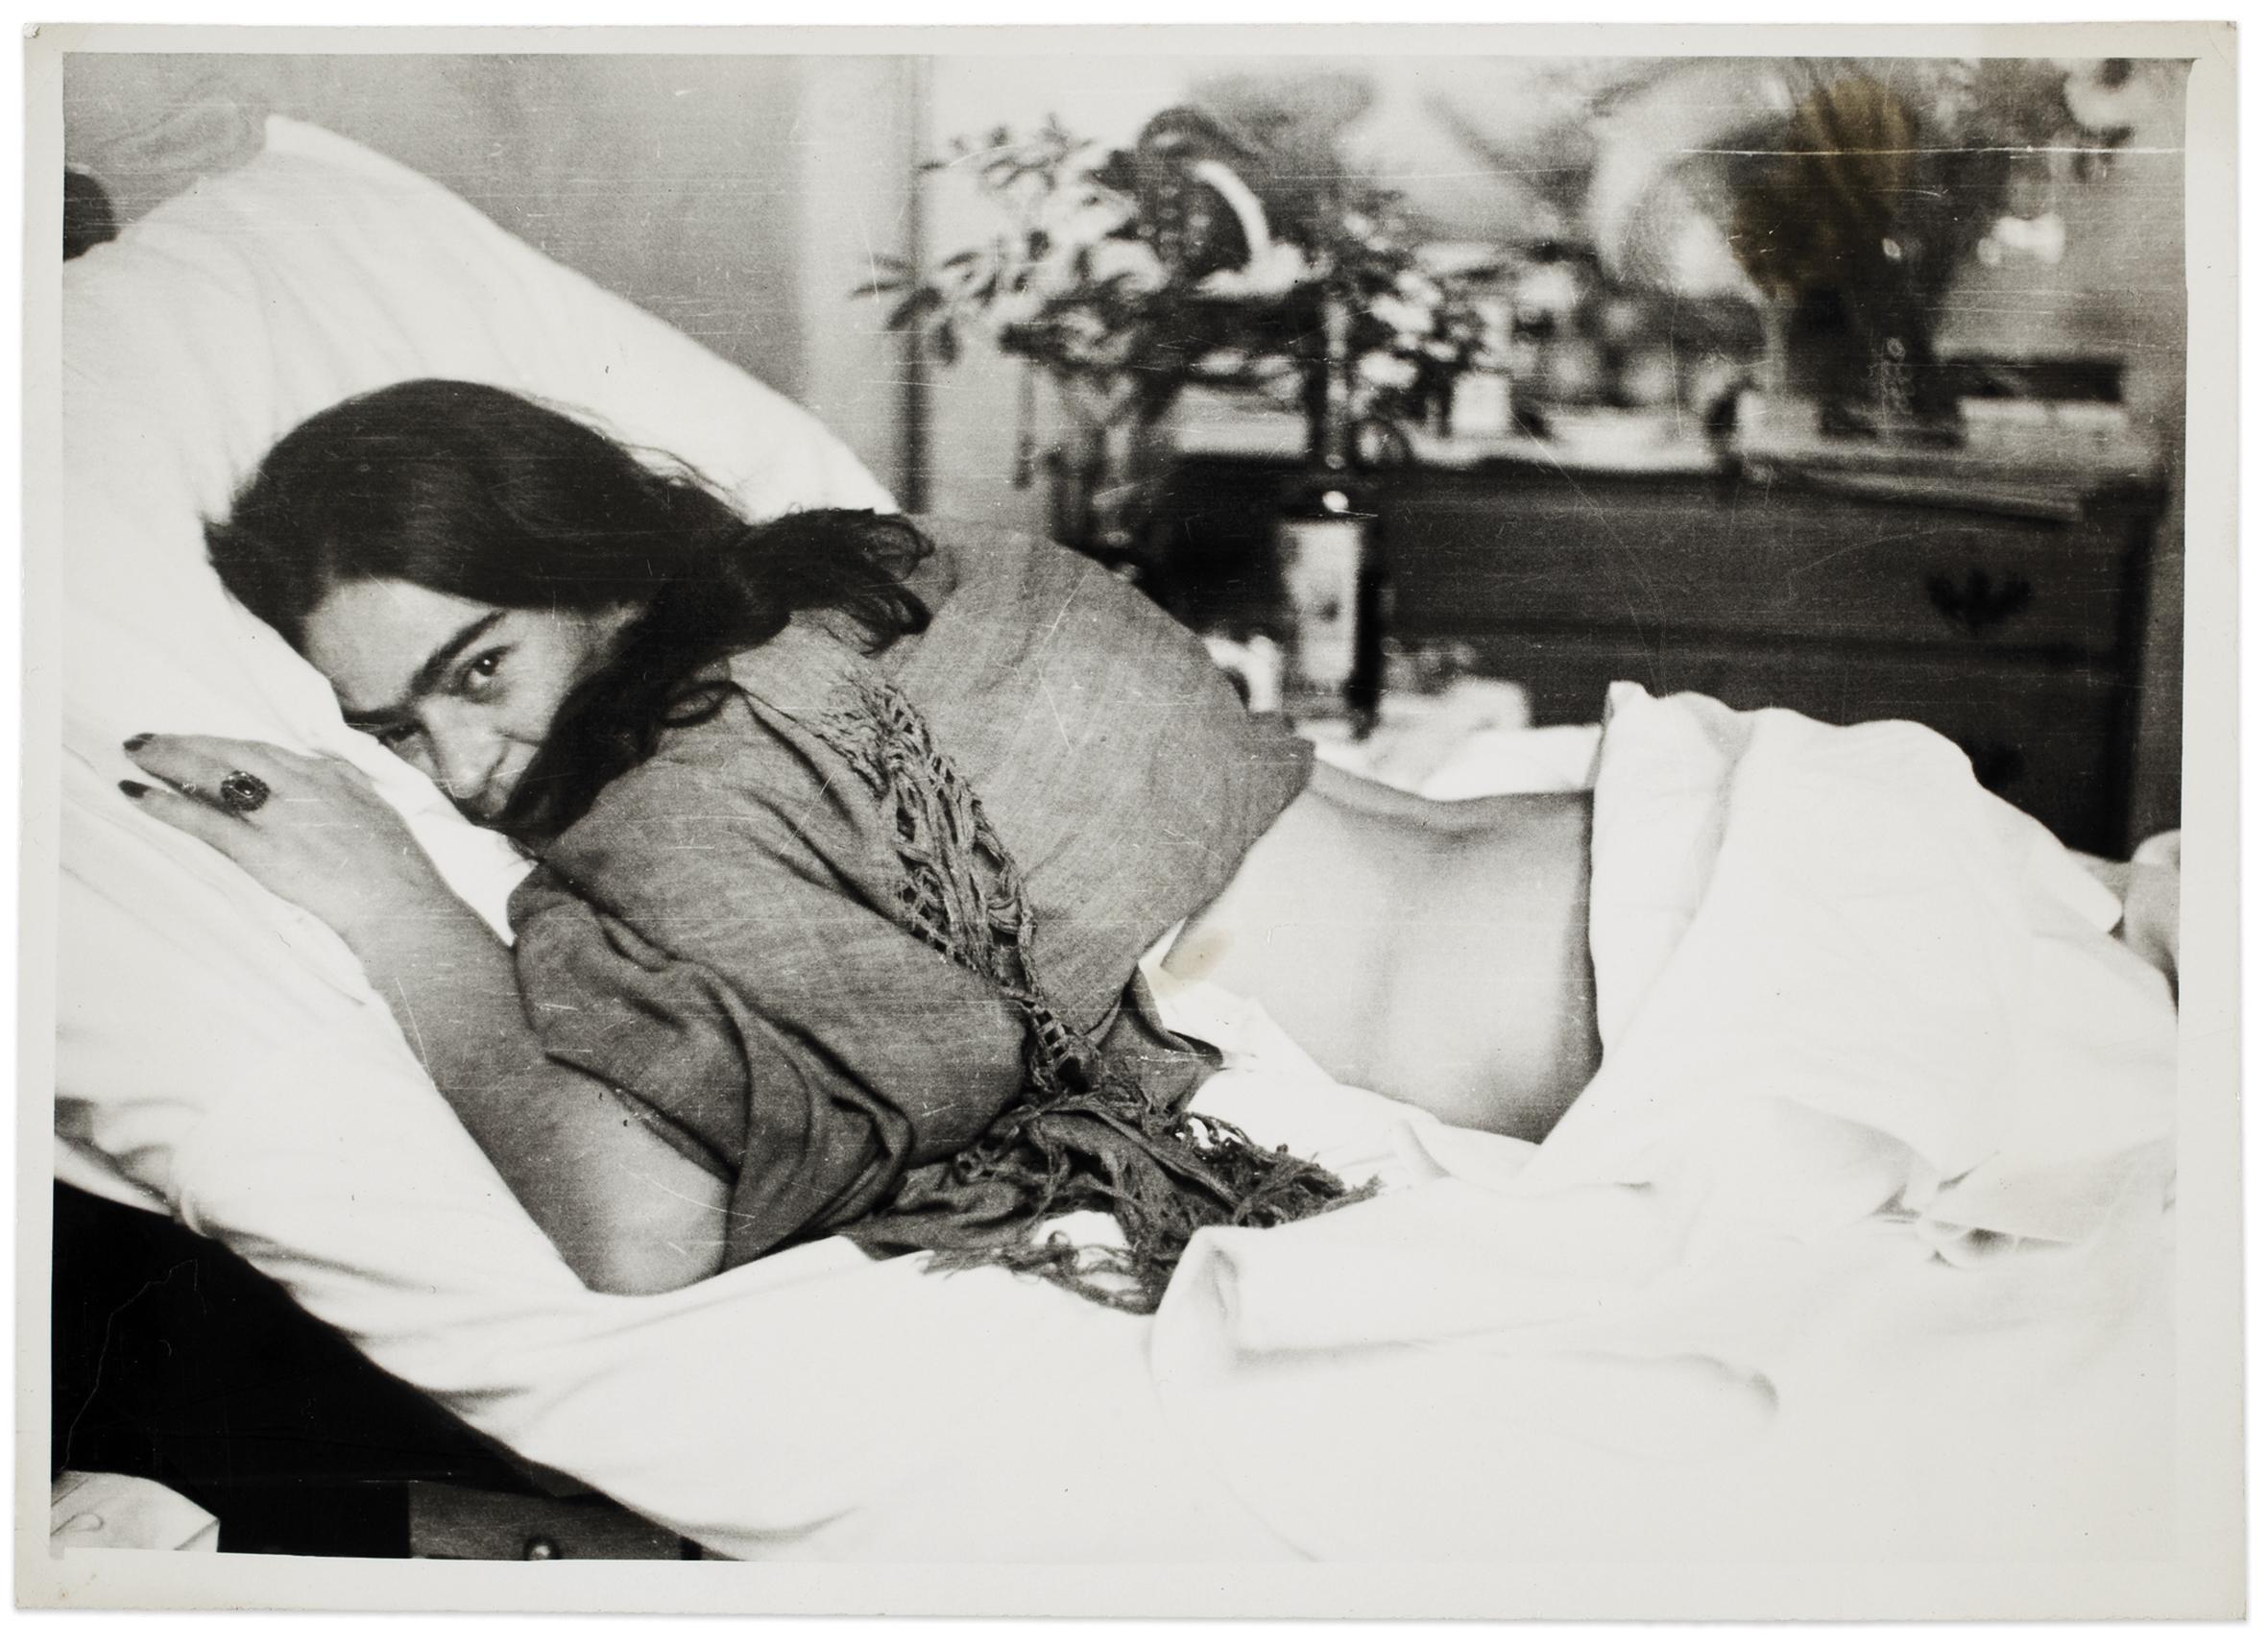 Frida  de  barriga  para  baixo,  por  Nickolas  Muray,  1946  ©  Museu  Frida  Kahlo